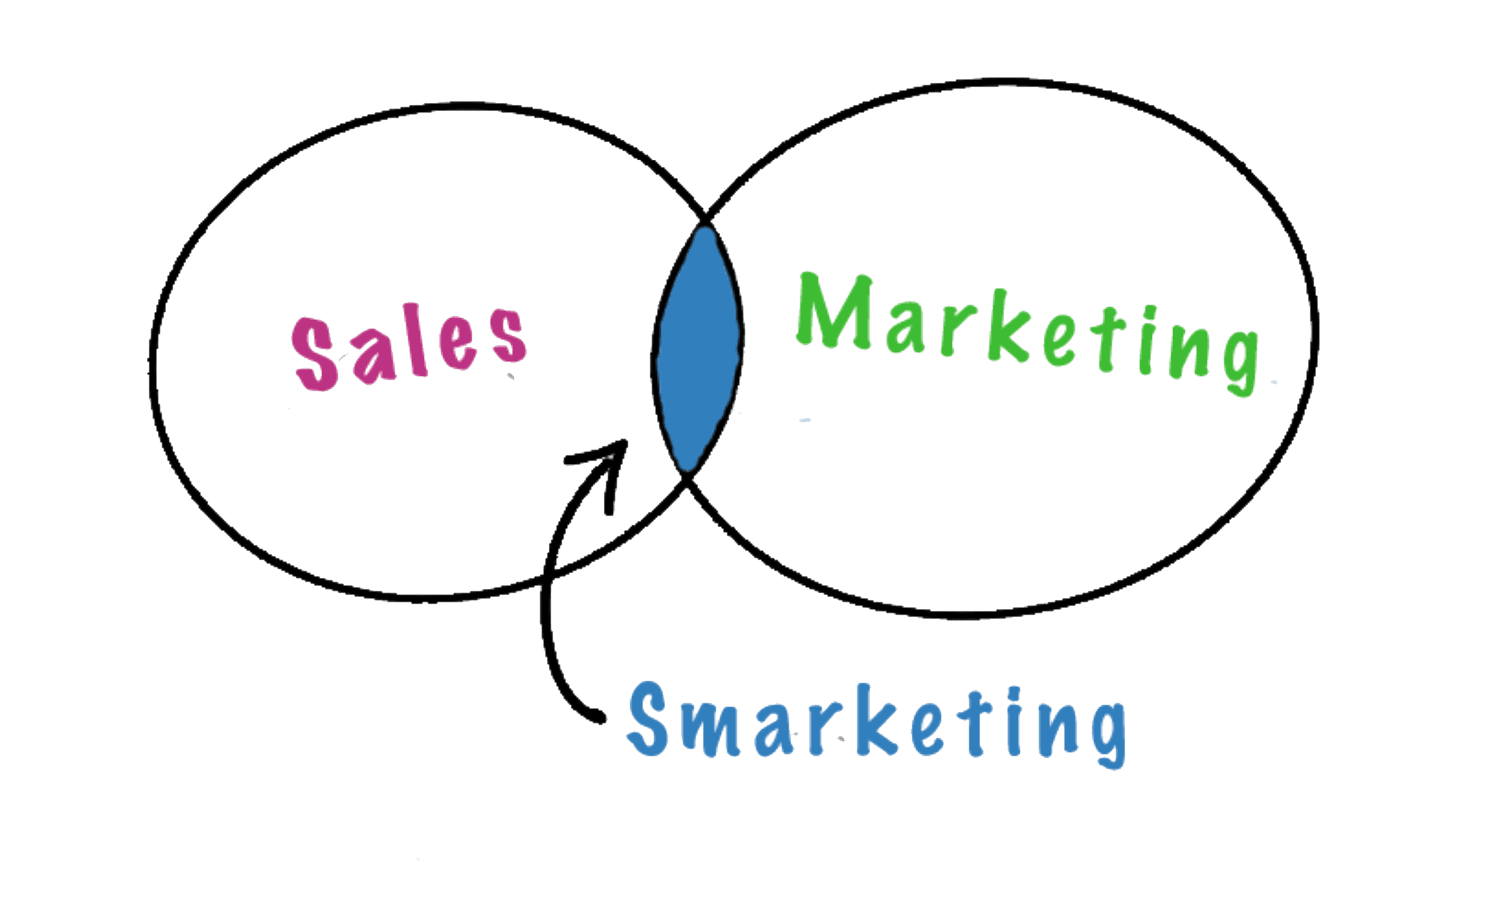 smarketing-sales-en-marketing